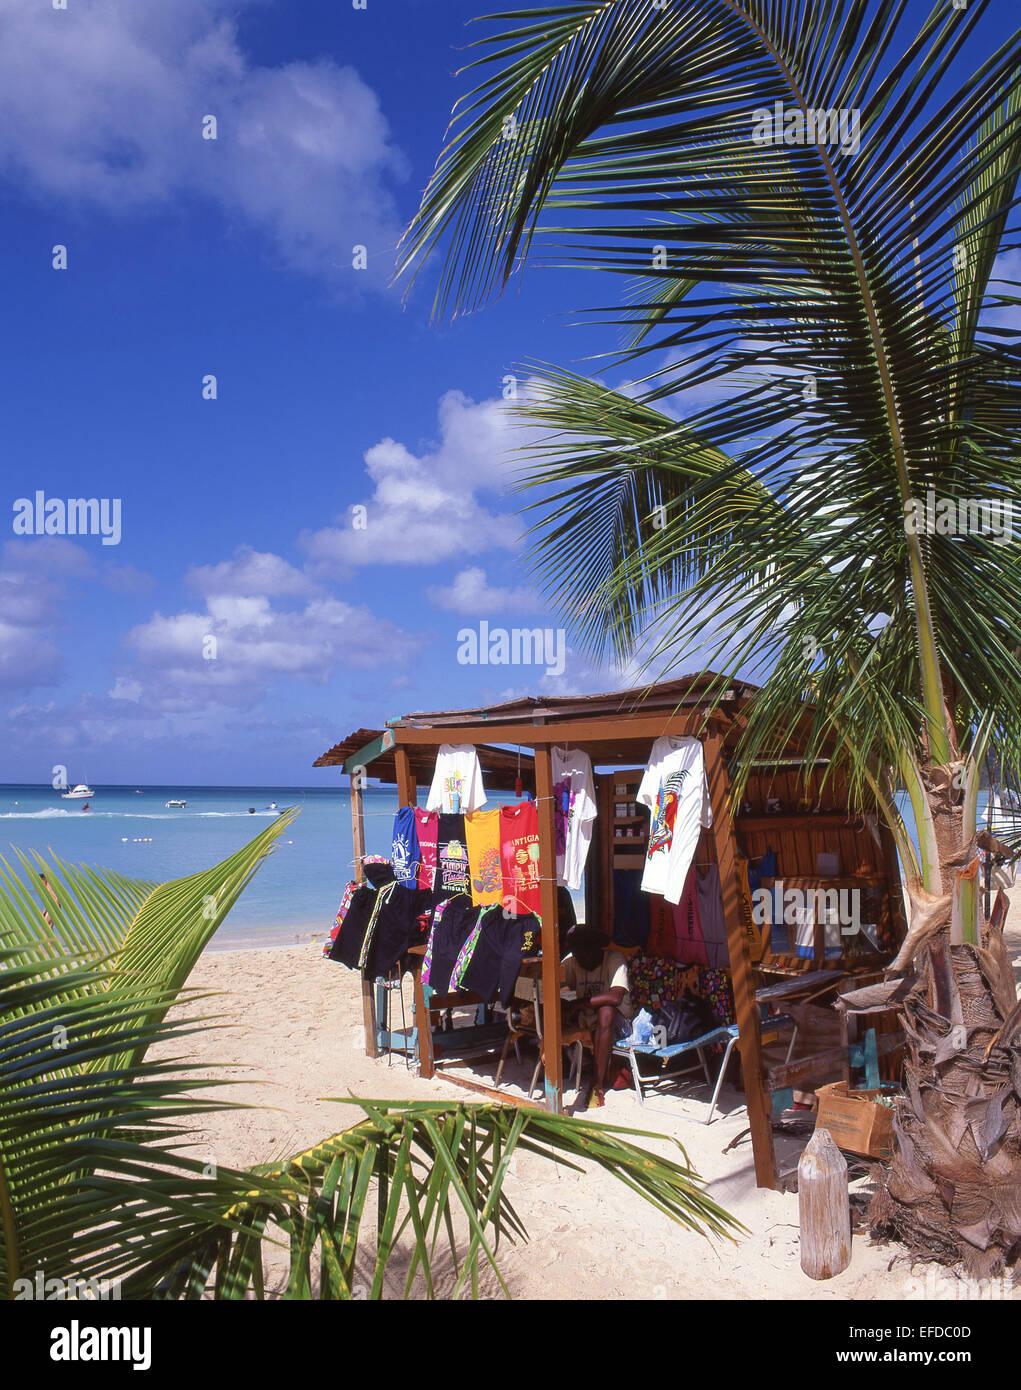 Beach stall at Jolly Beach Resort & Spa, Saint Mary's Parish, Antigua, Antigua and Barbuda, Lesser Antilles, - Stock Image